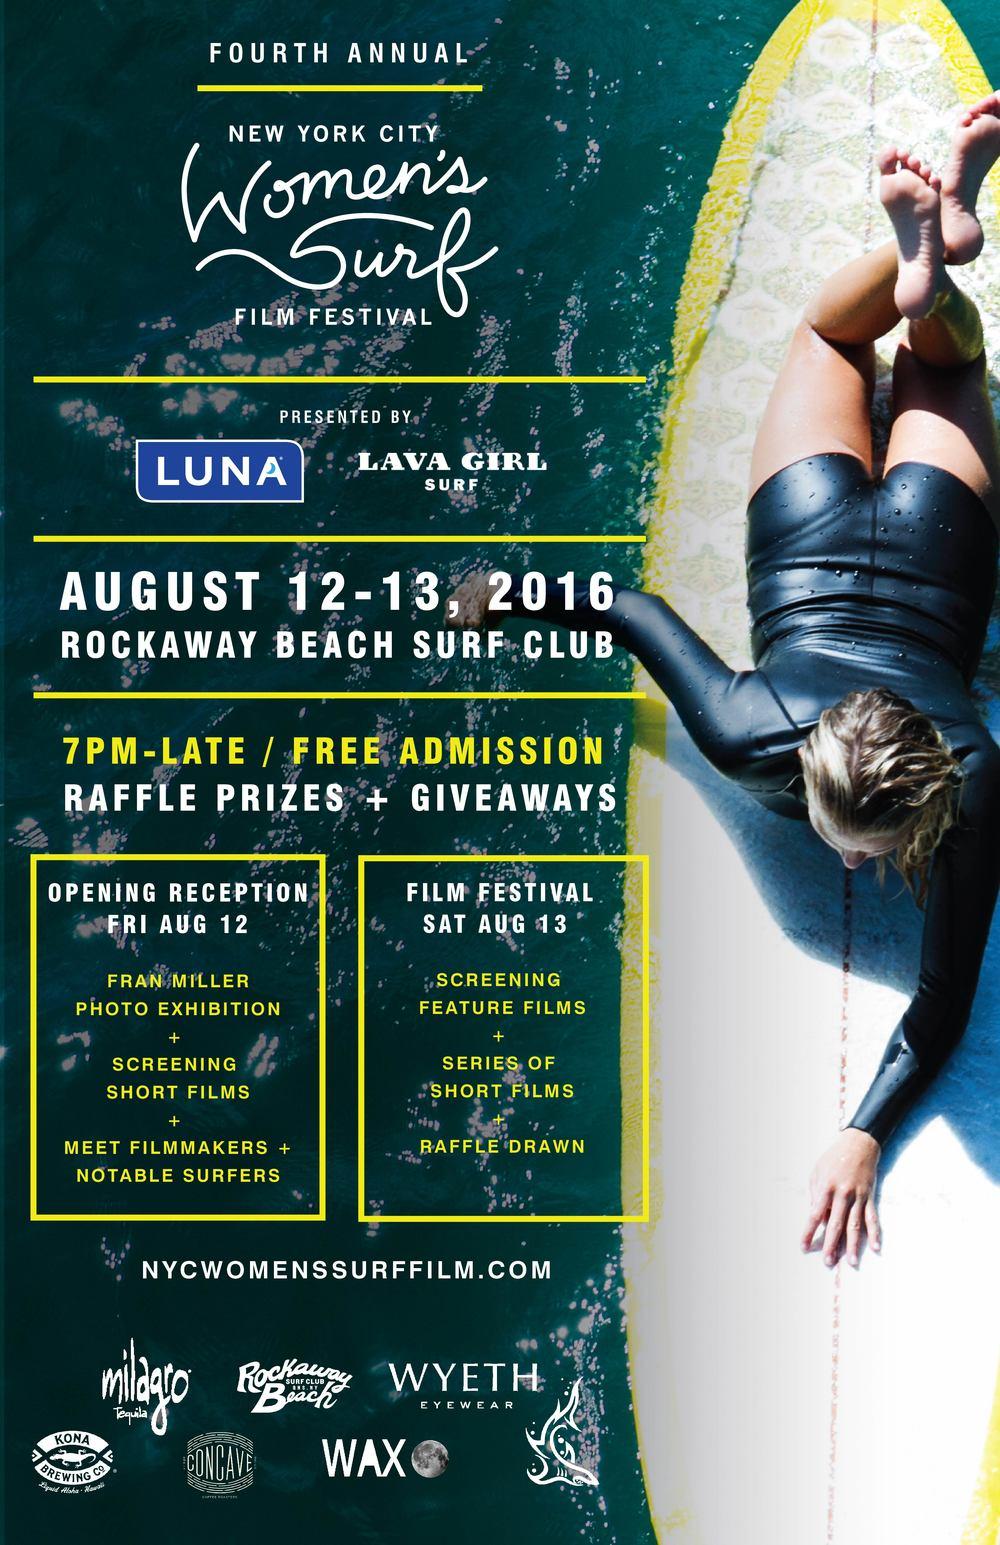 NYC Women's Surf Film Festival 2016